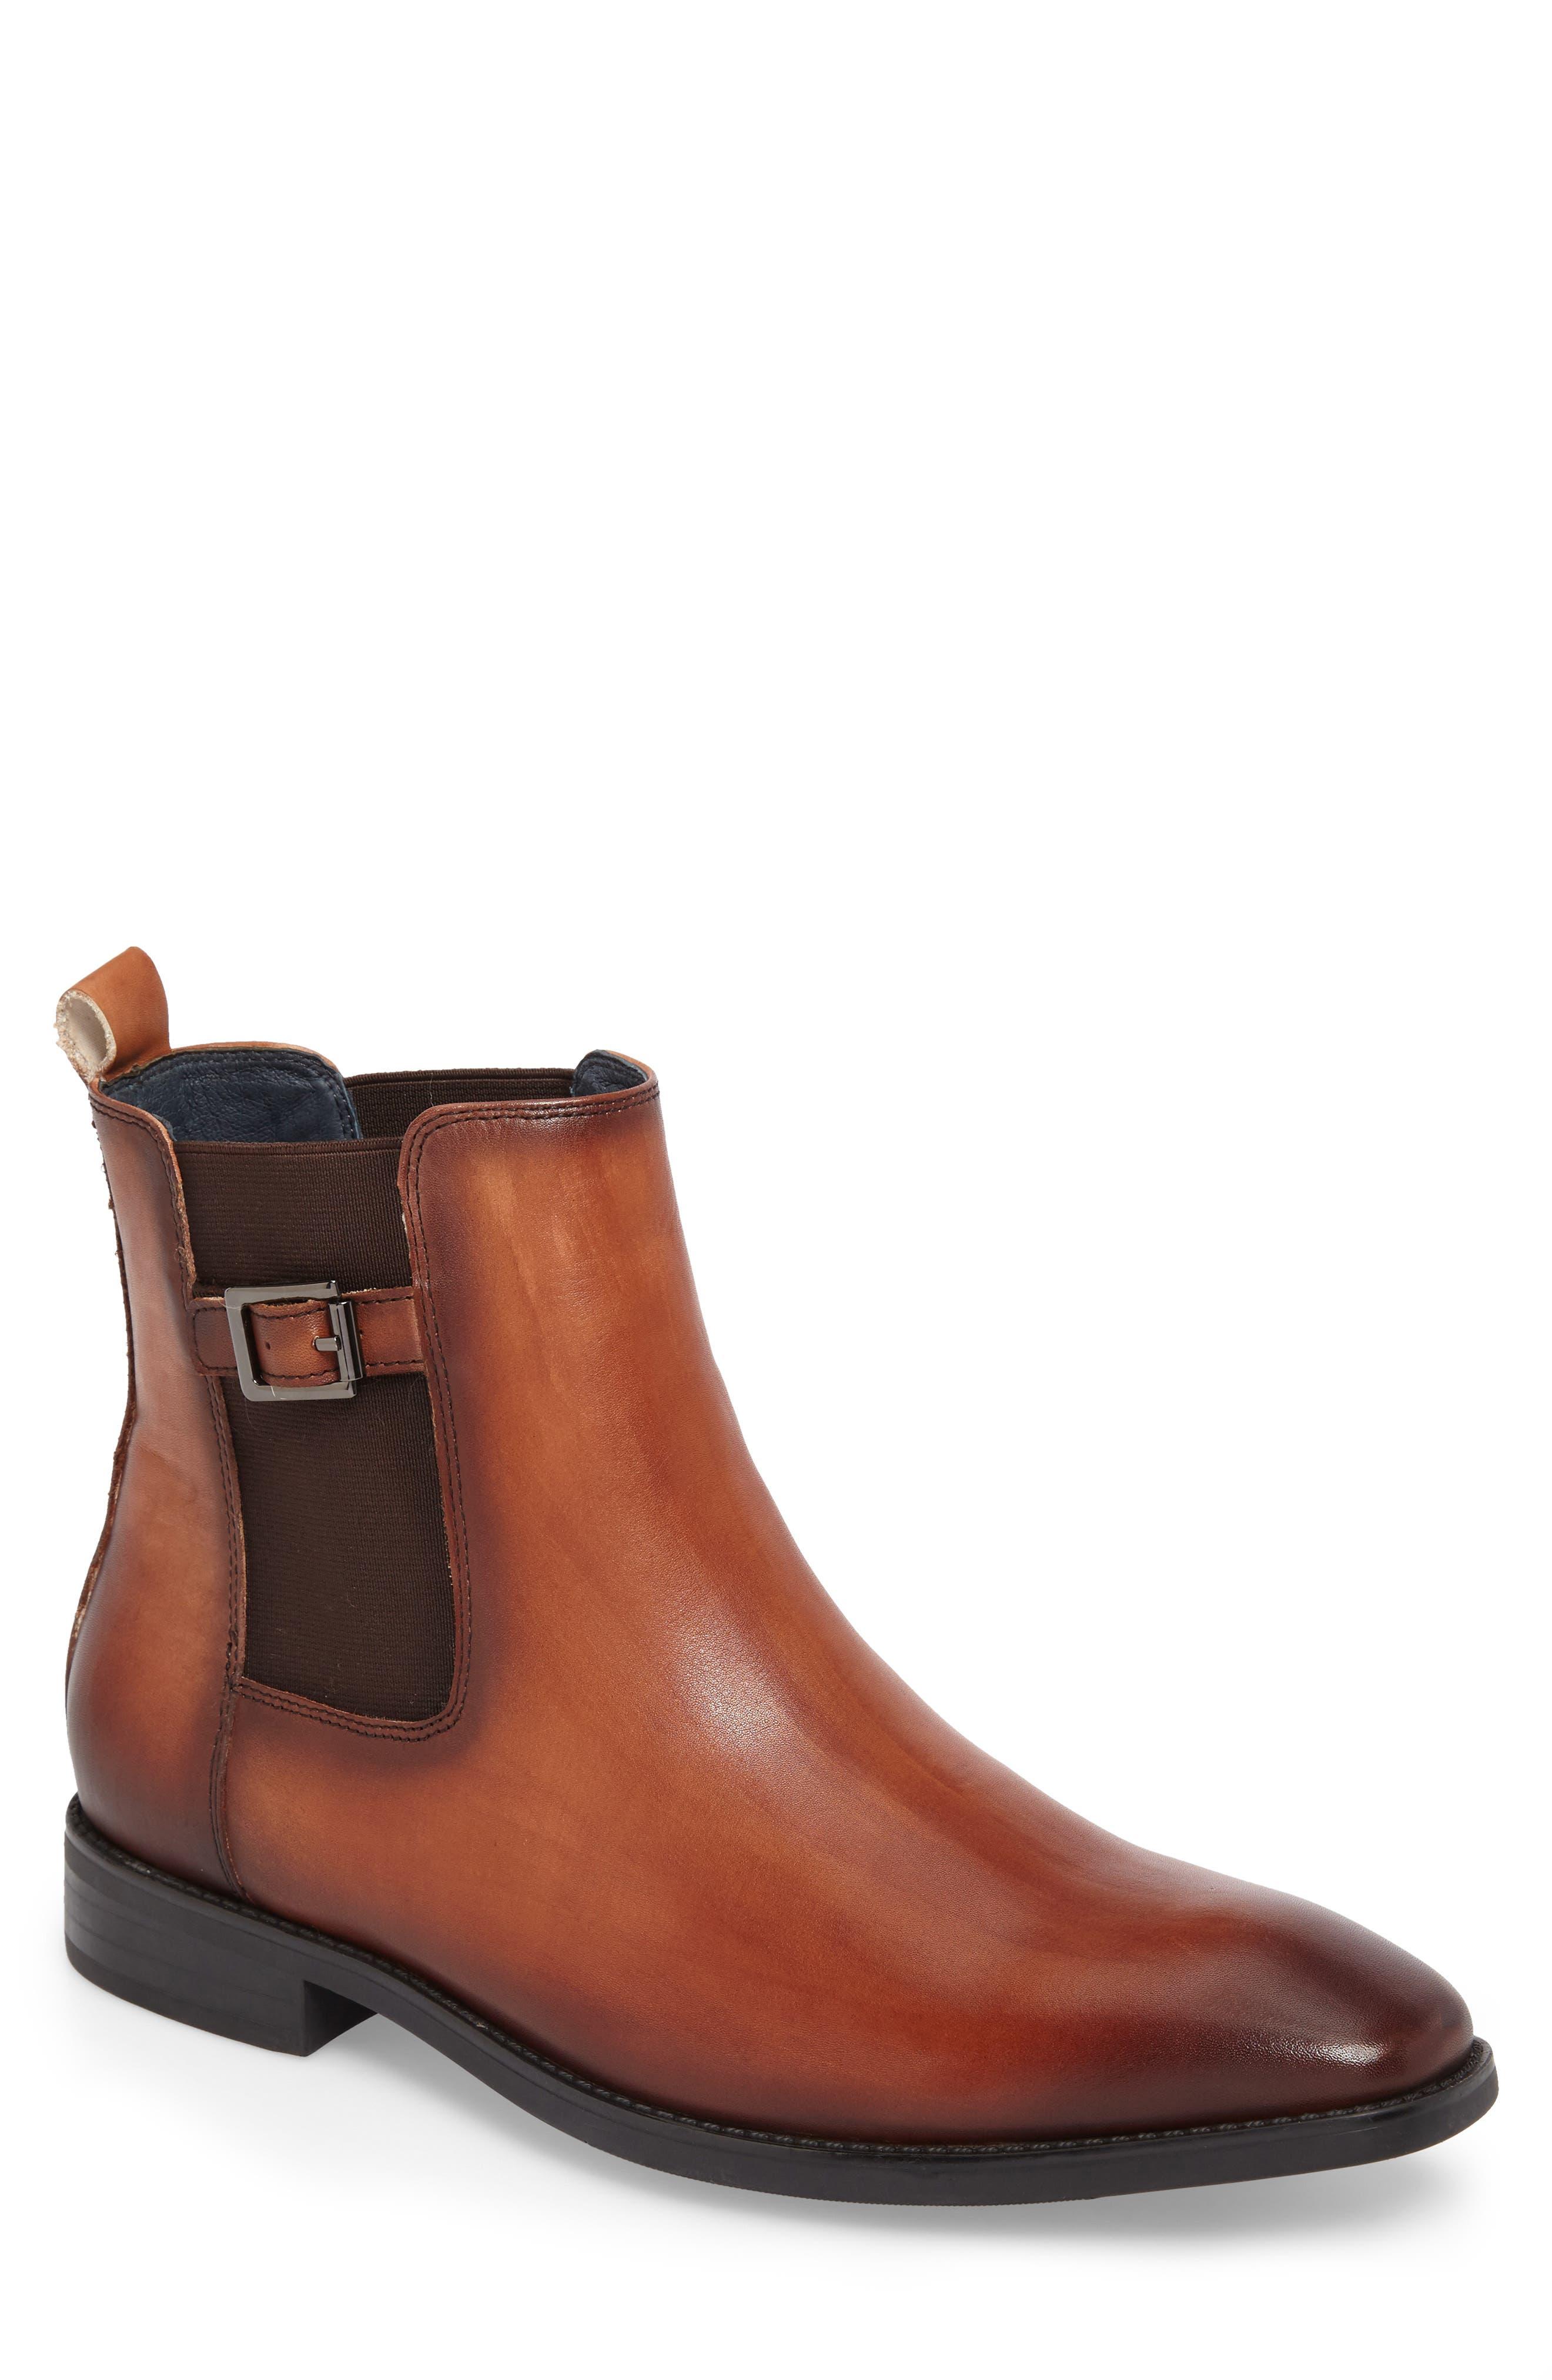 Main Image - Jump Loden Chelsea Boot (Men)